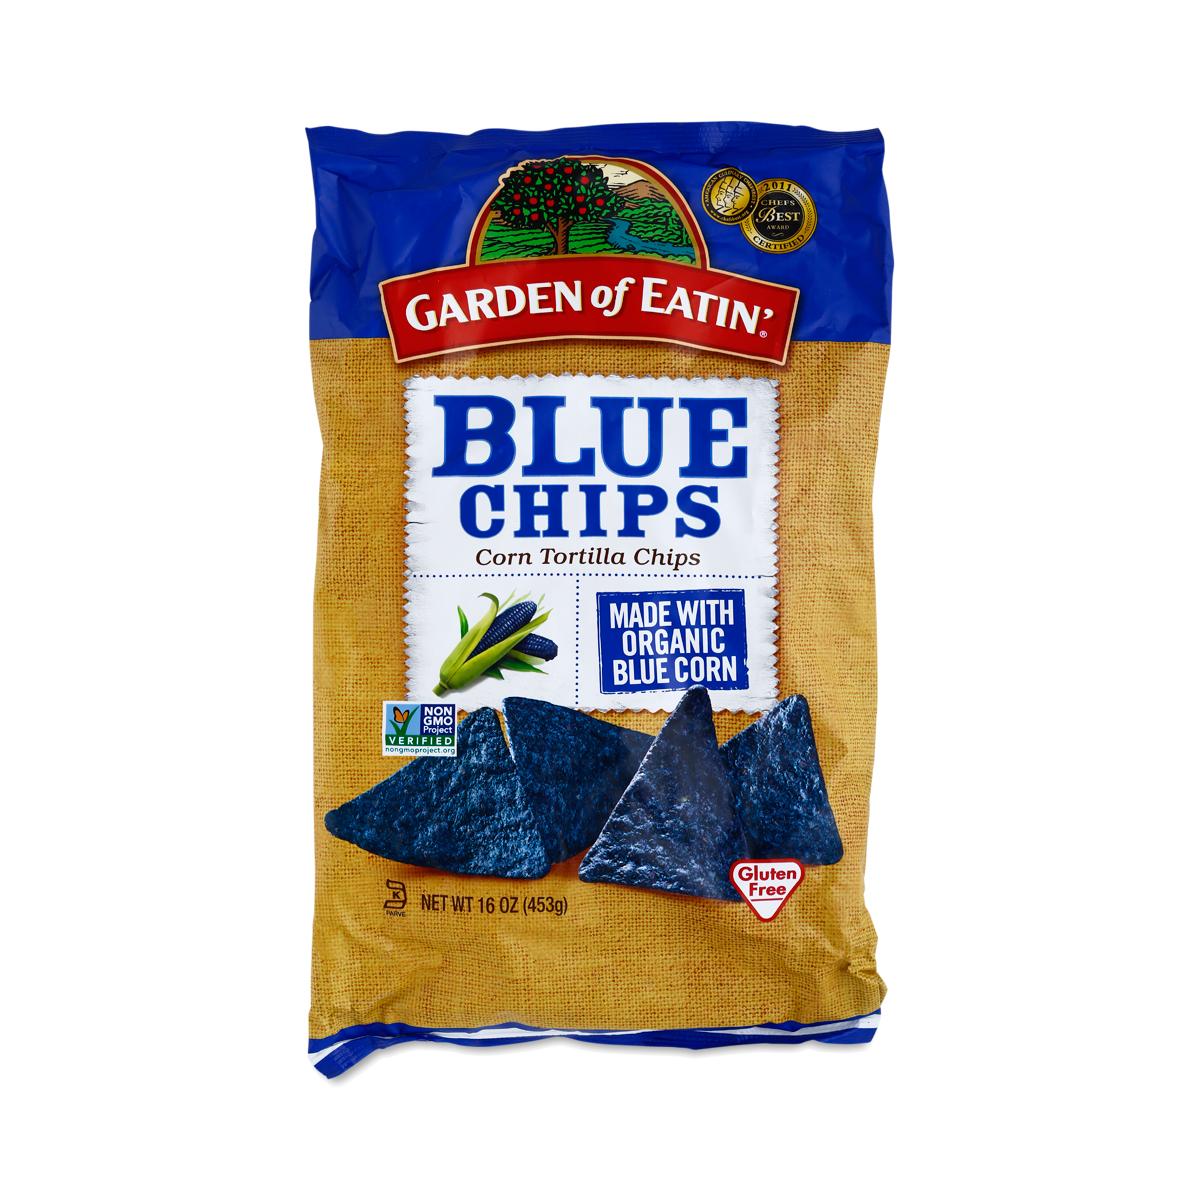 16 Oz Blue Corn Tortilla Chips By Garden Of Eatin